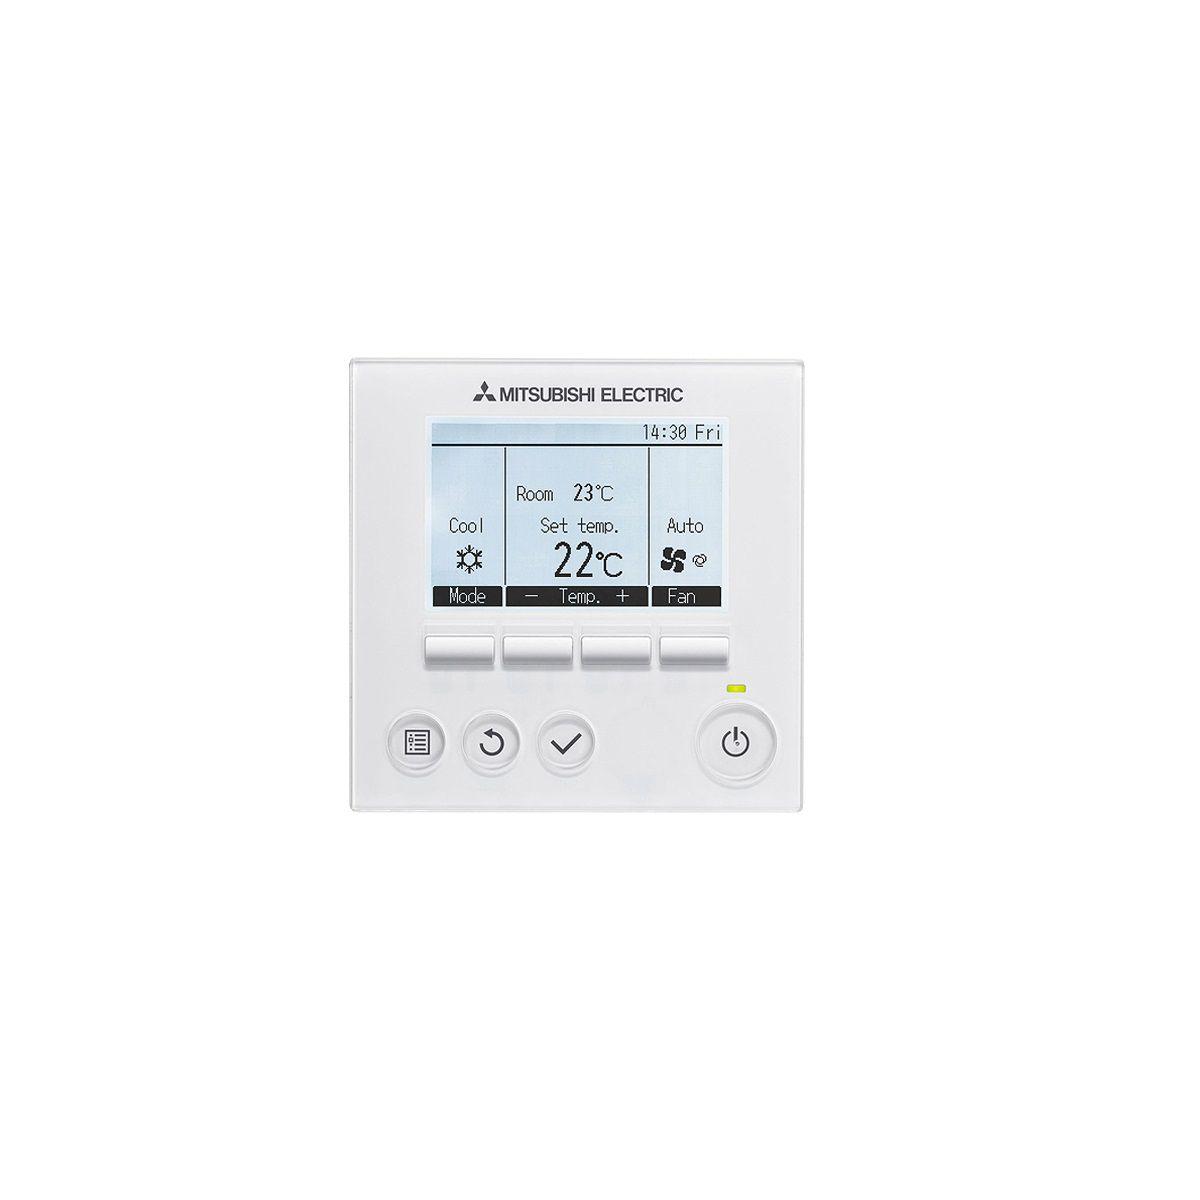 Mitsubishi par 31maa j mitsubishi par 31maa j wired remote control buycottarizona Choice Image